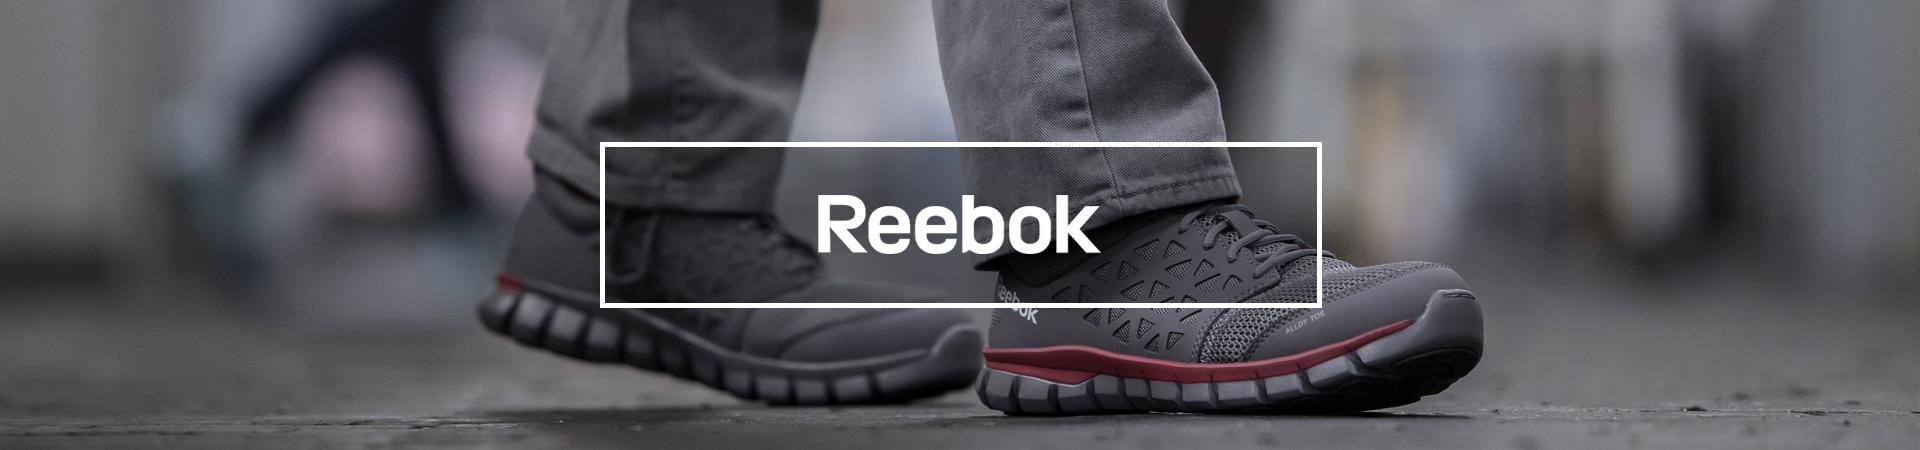 lavar muy Recurso  Reebok Slip Resistant Shoes